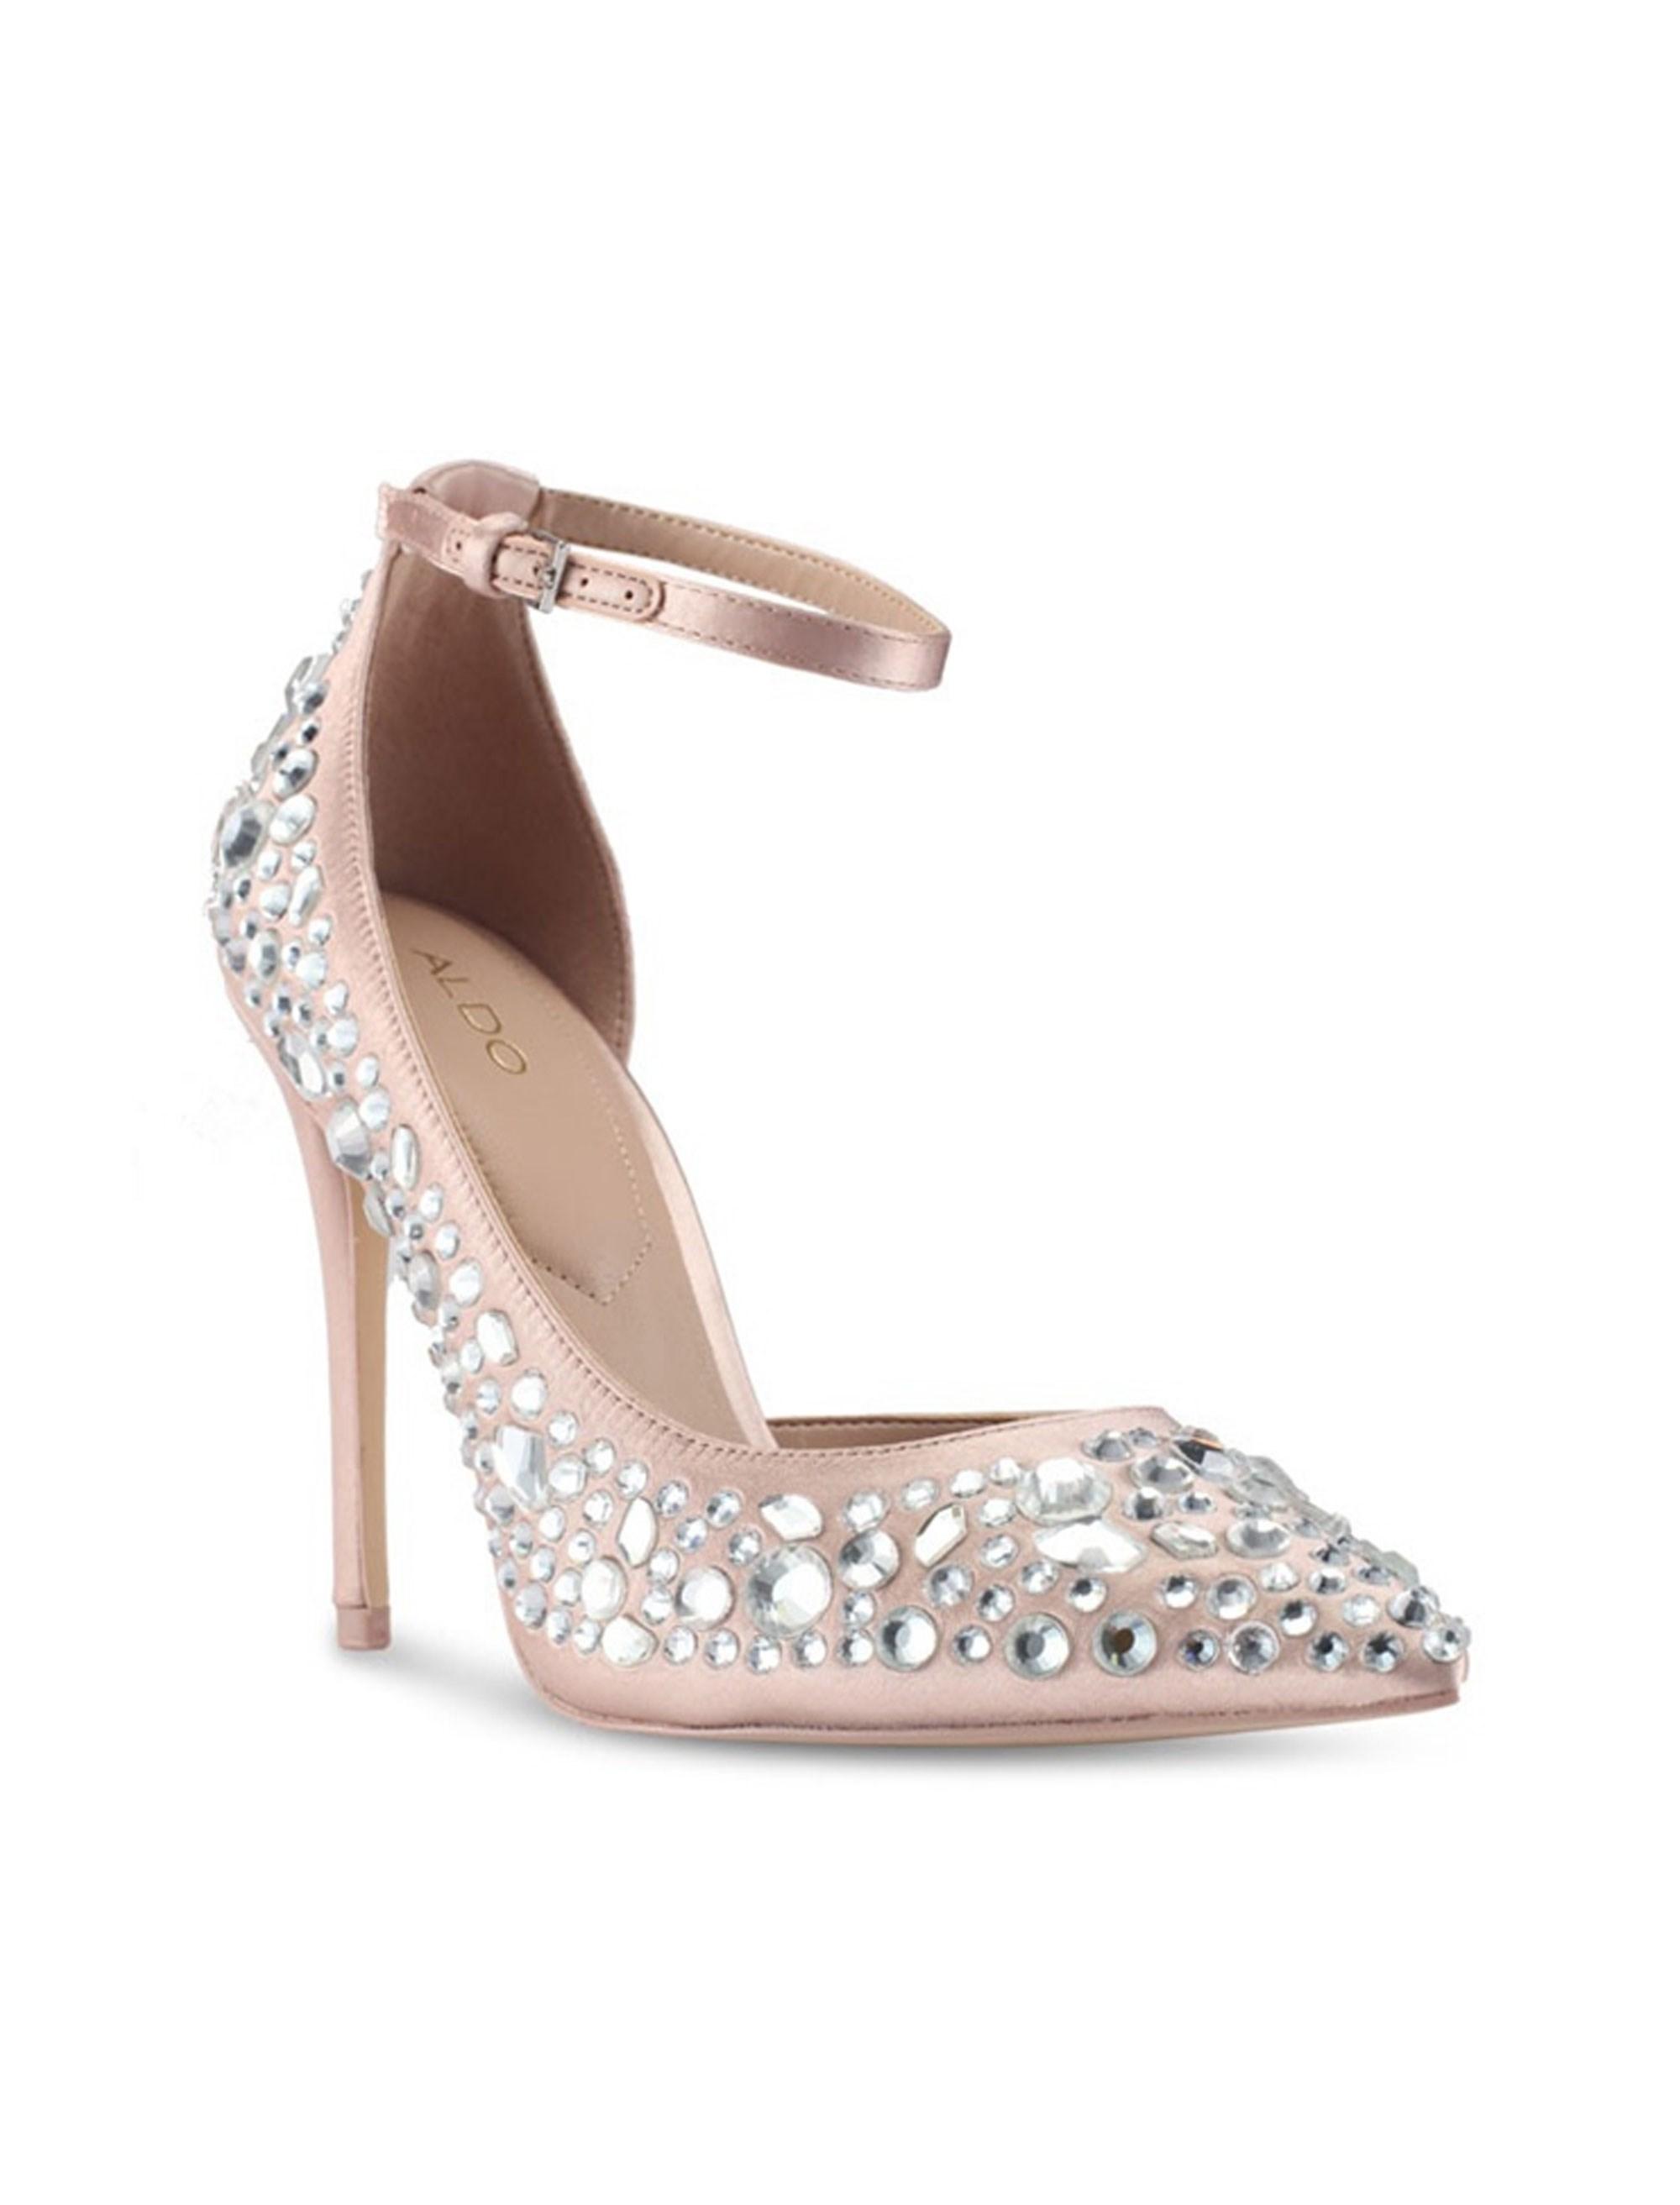 کفش پاشنه بلند پارچه ای زنانه - آلدو - صورتي روشن - 5